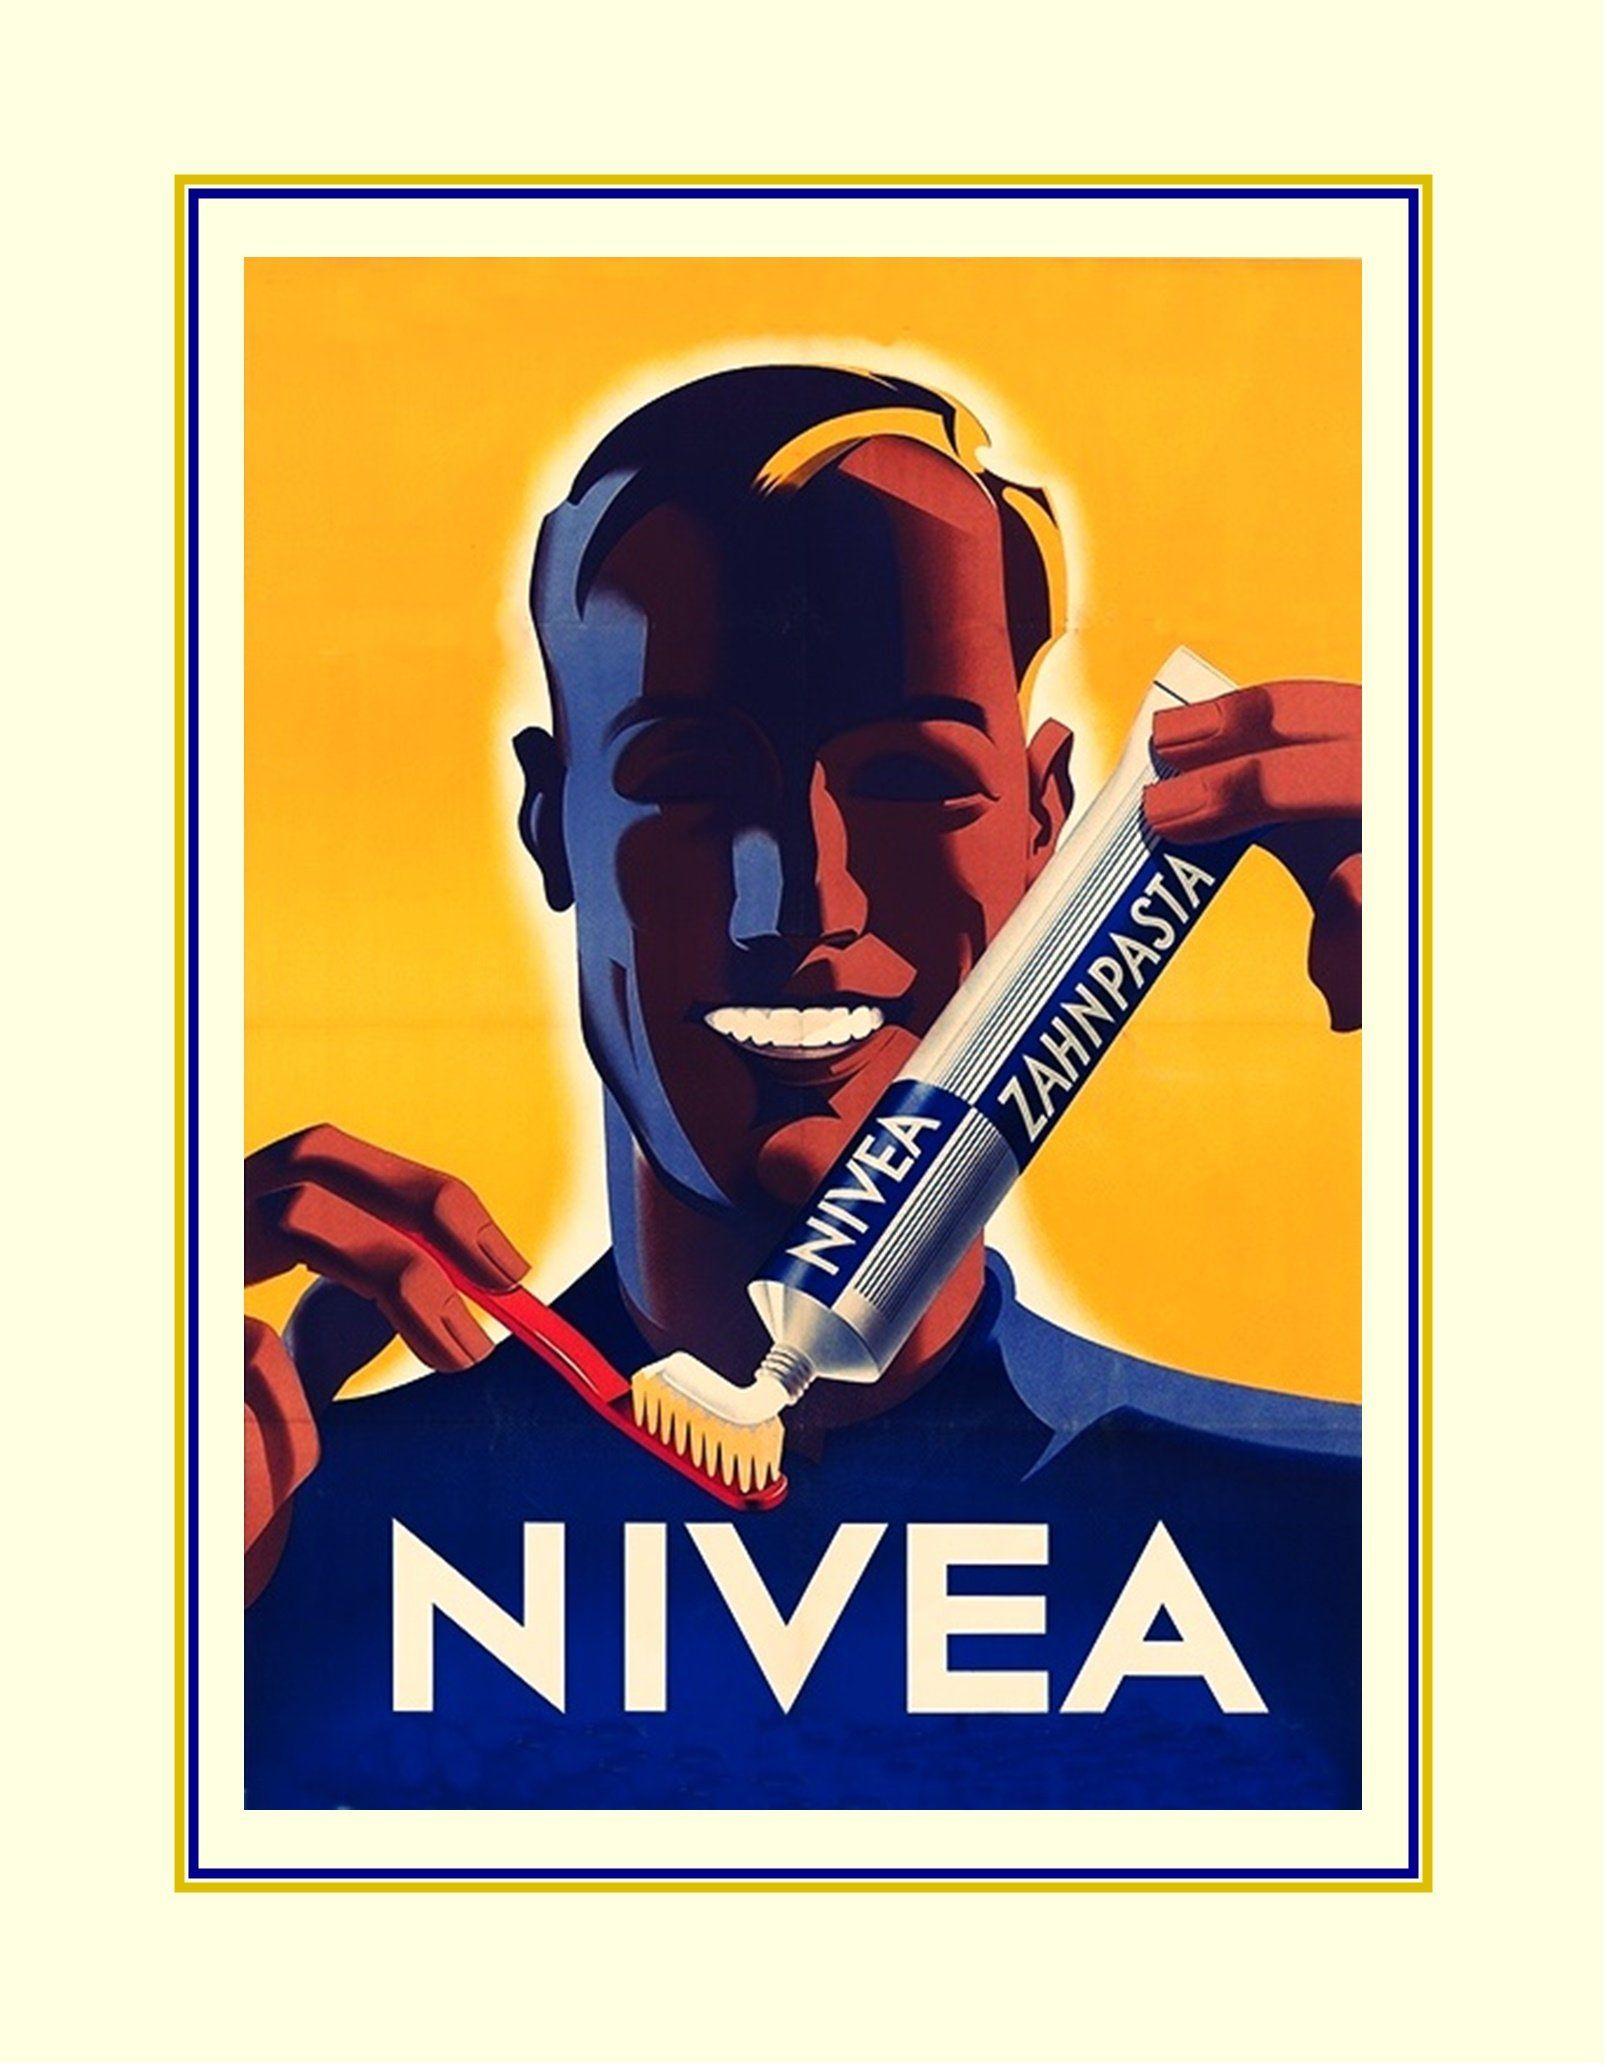 Gold nivea dental soap poster blue bathroom illustration wall art